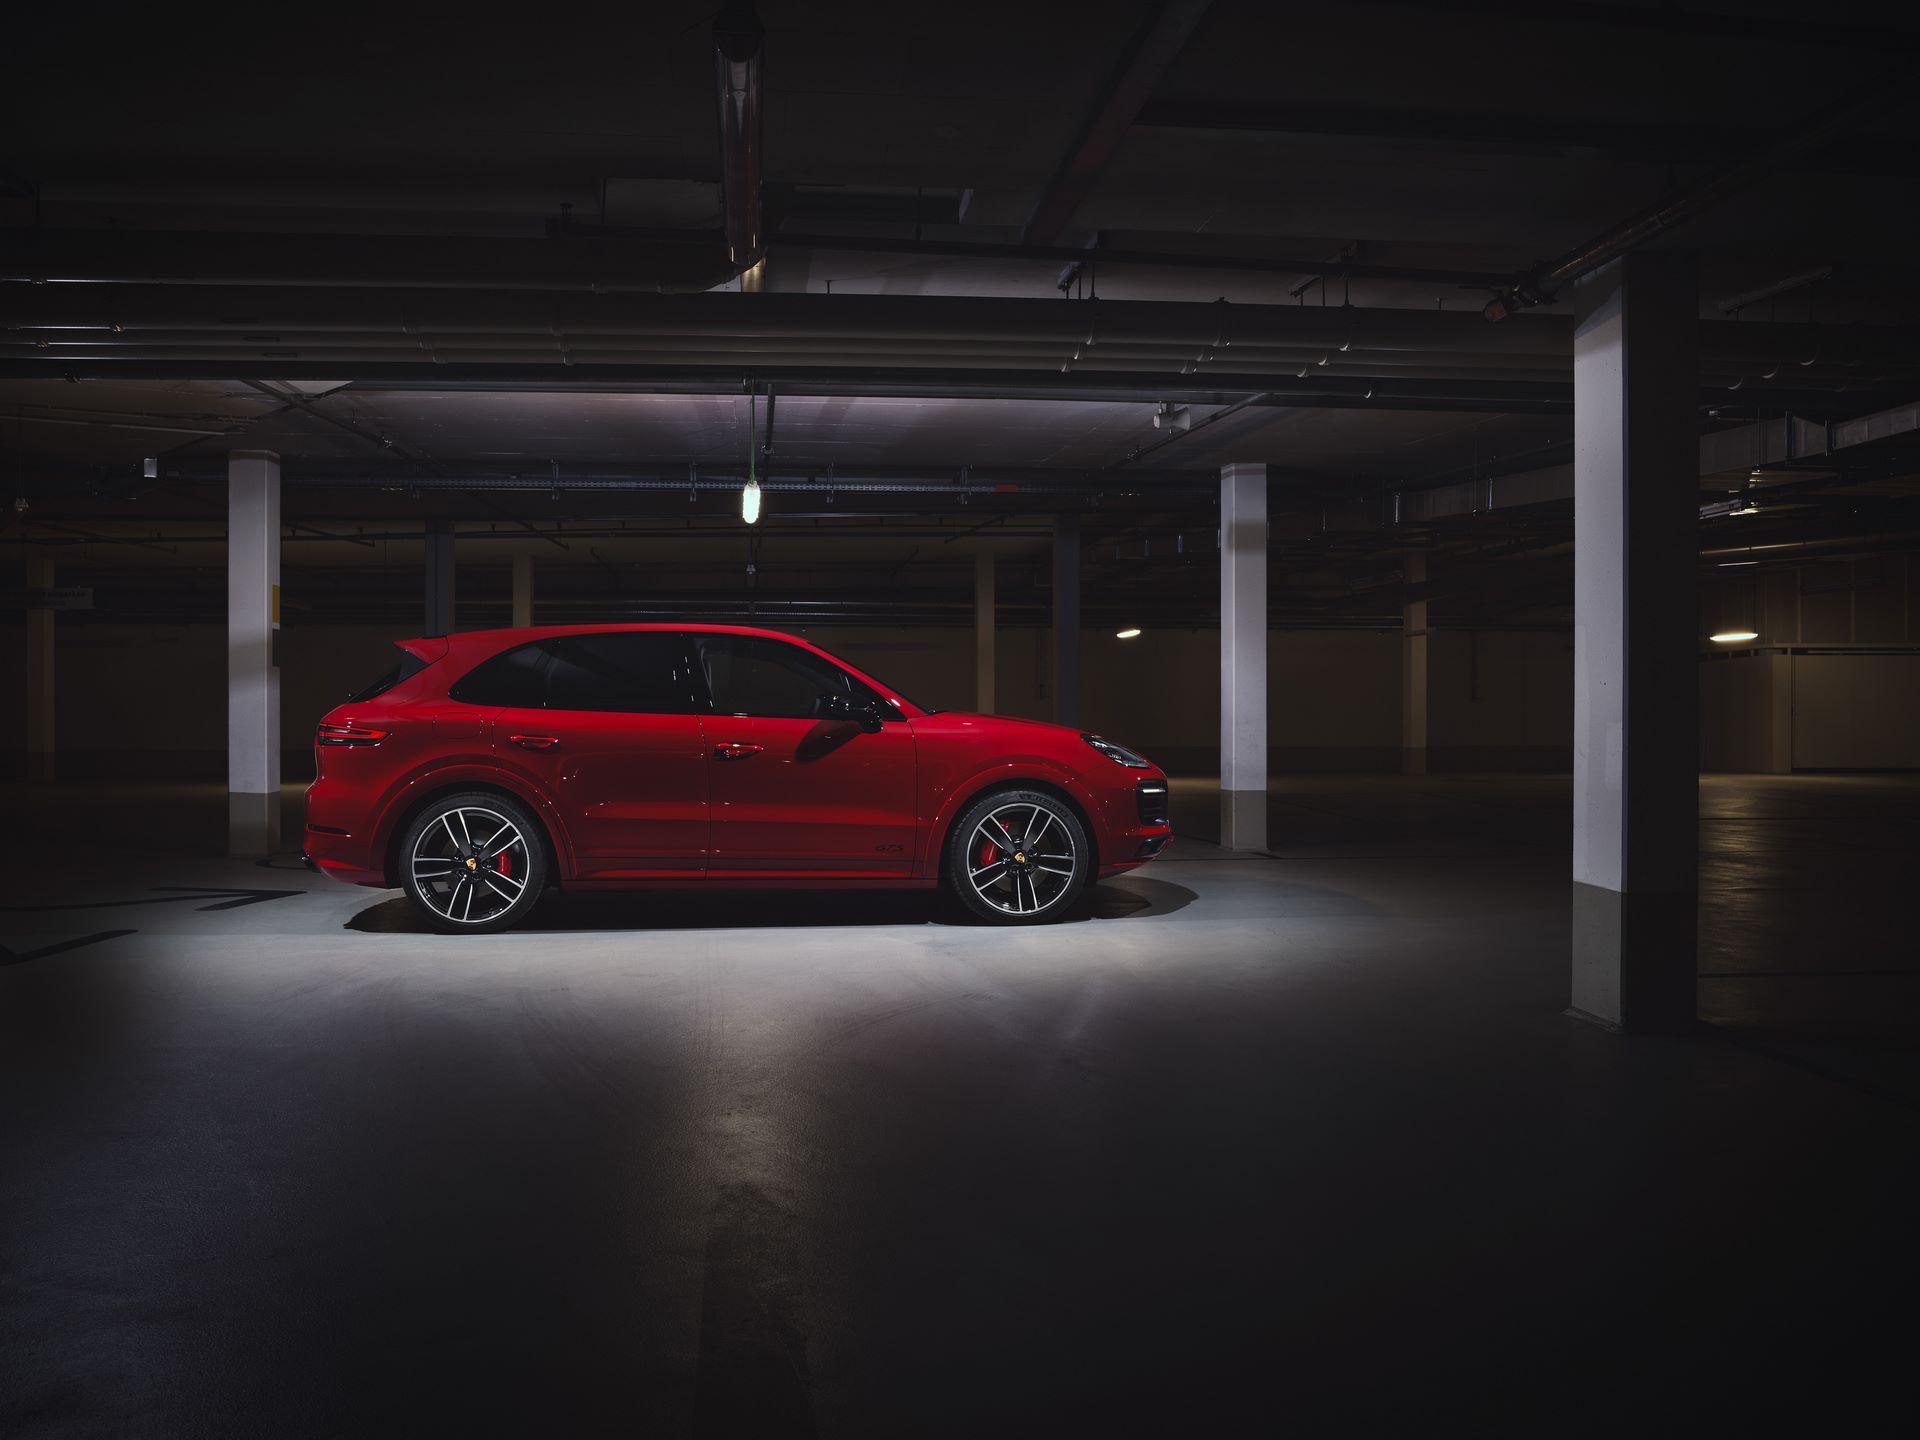 Porsche-Cayenne-GTS-and-Cayenne-GTS-Coupe-2021-19